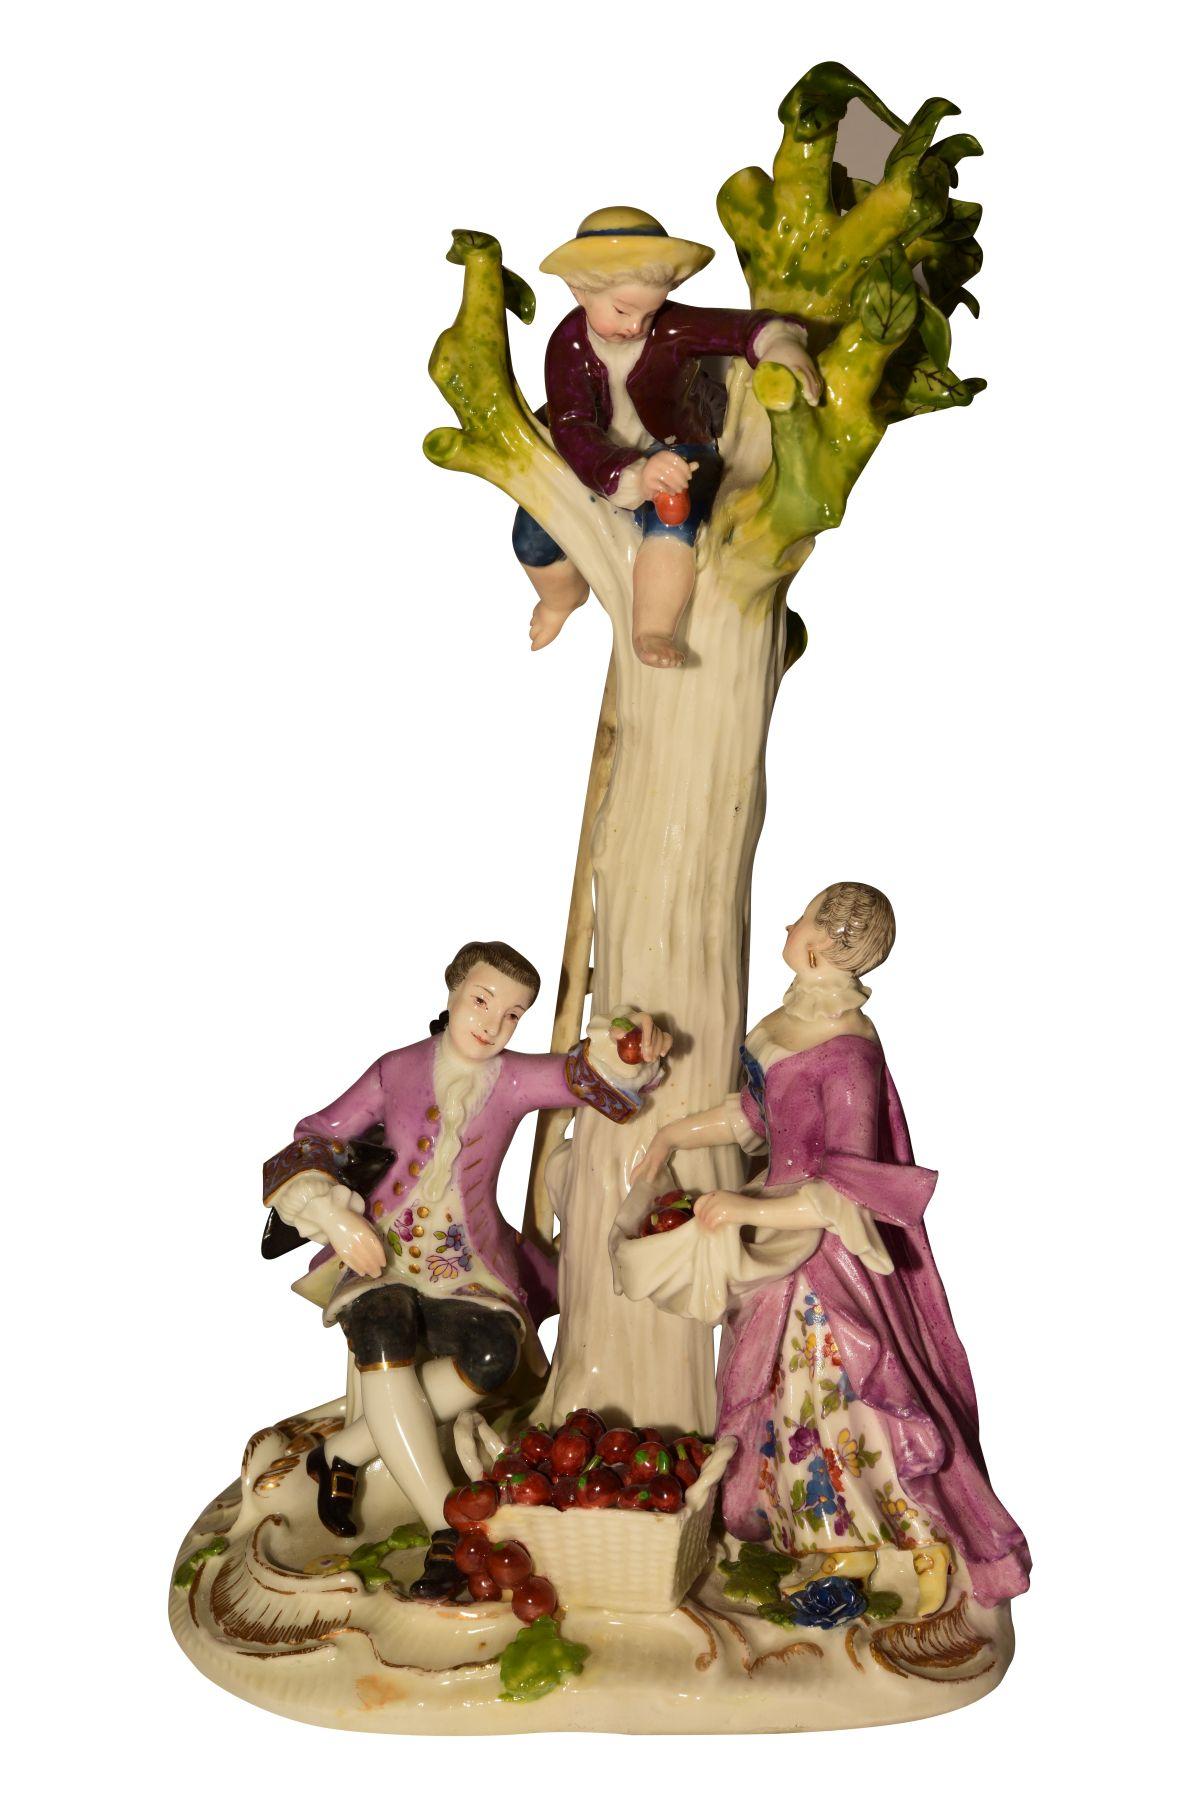 #118 1 group of Meissen 1750 apple pickers | 1 Gruppe Apfelpflücker Meissen 1750 Image